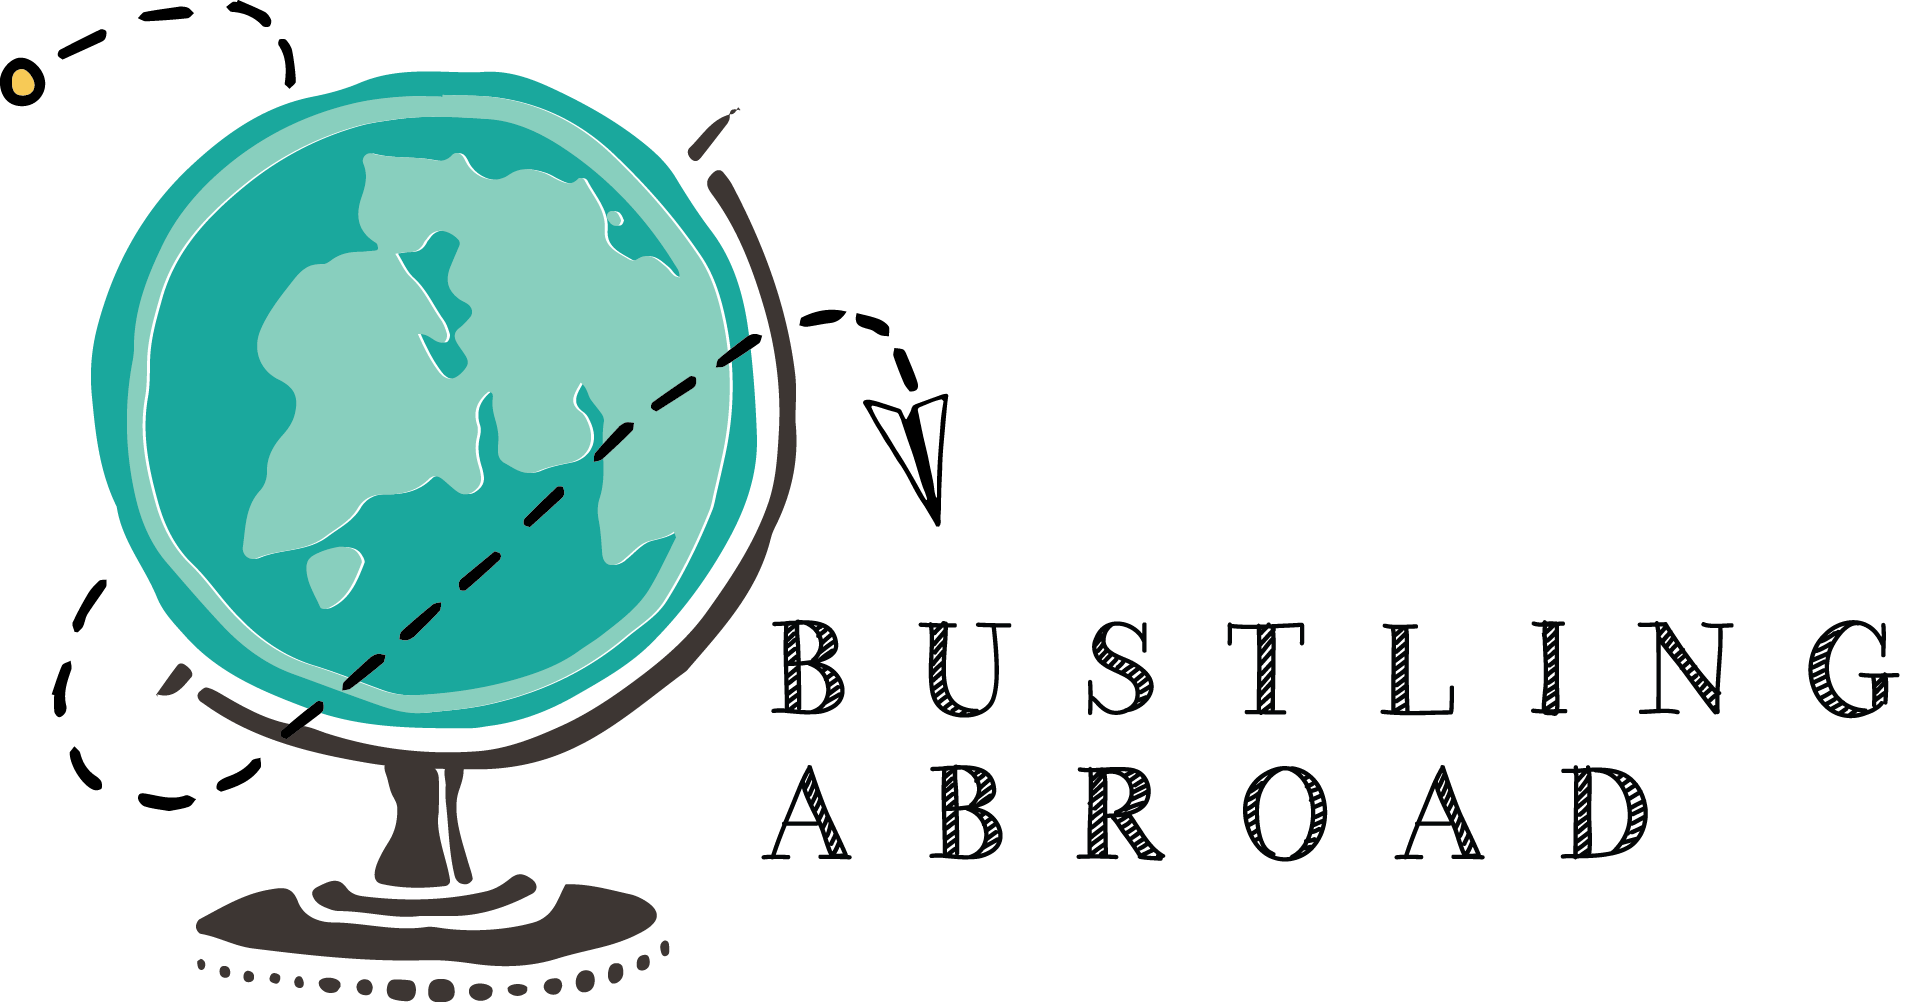 BustlingAbroad.com